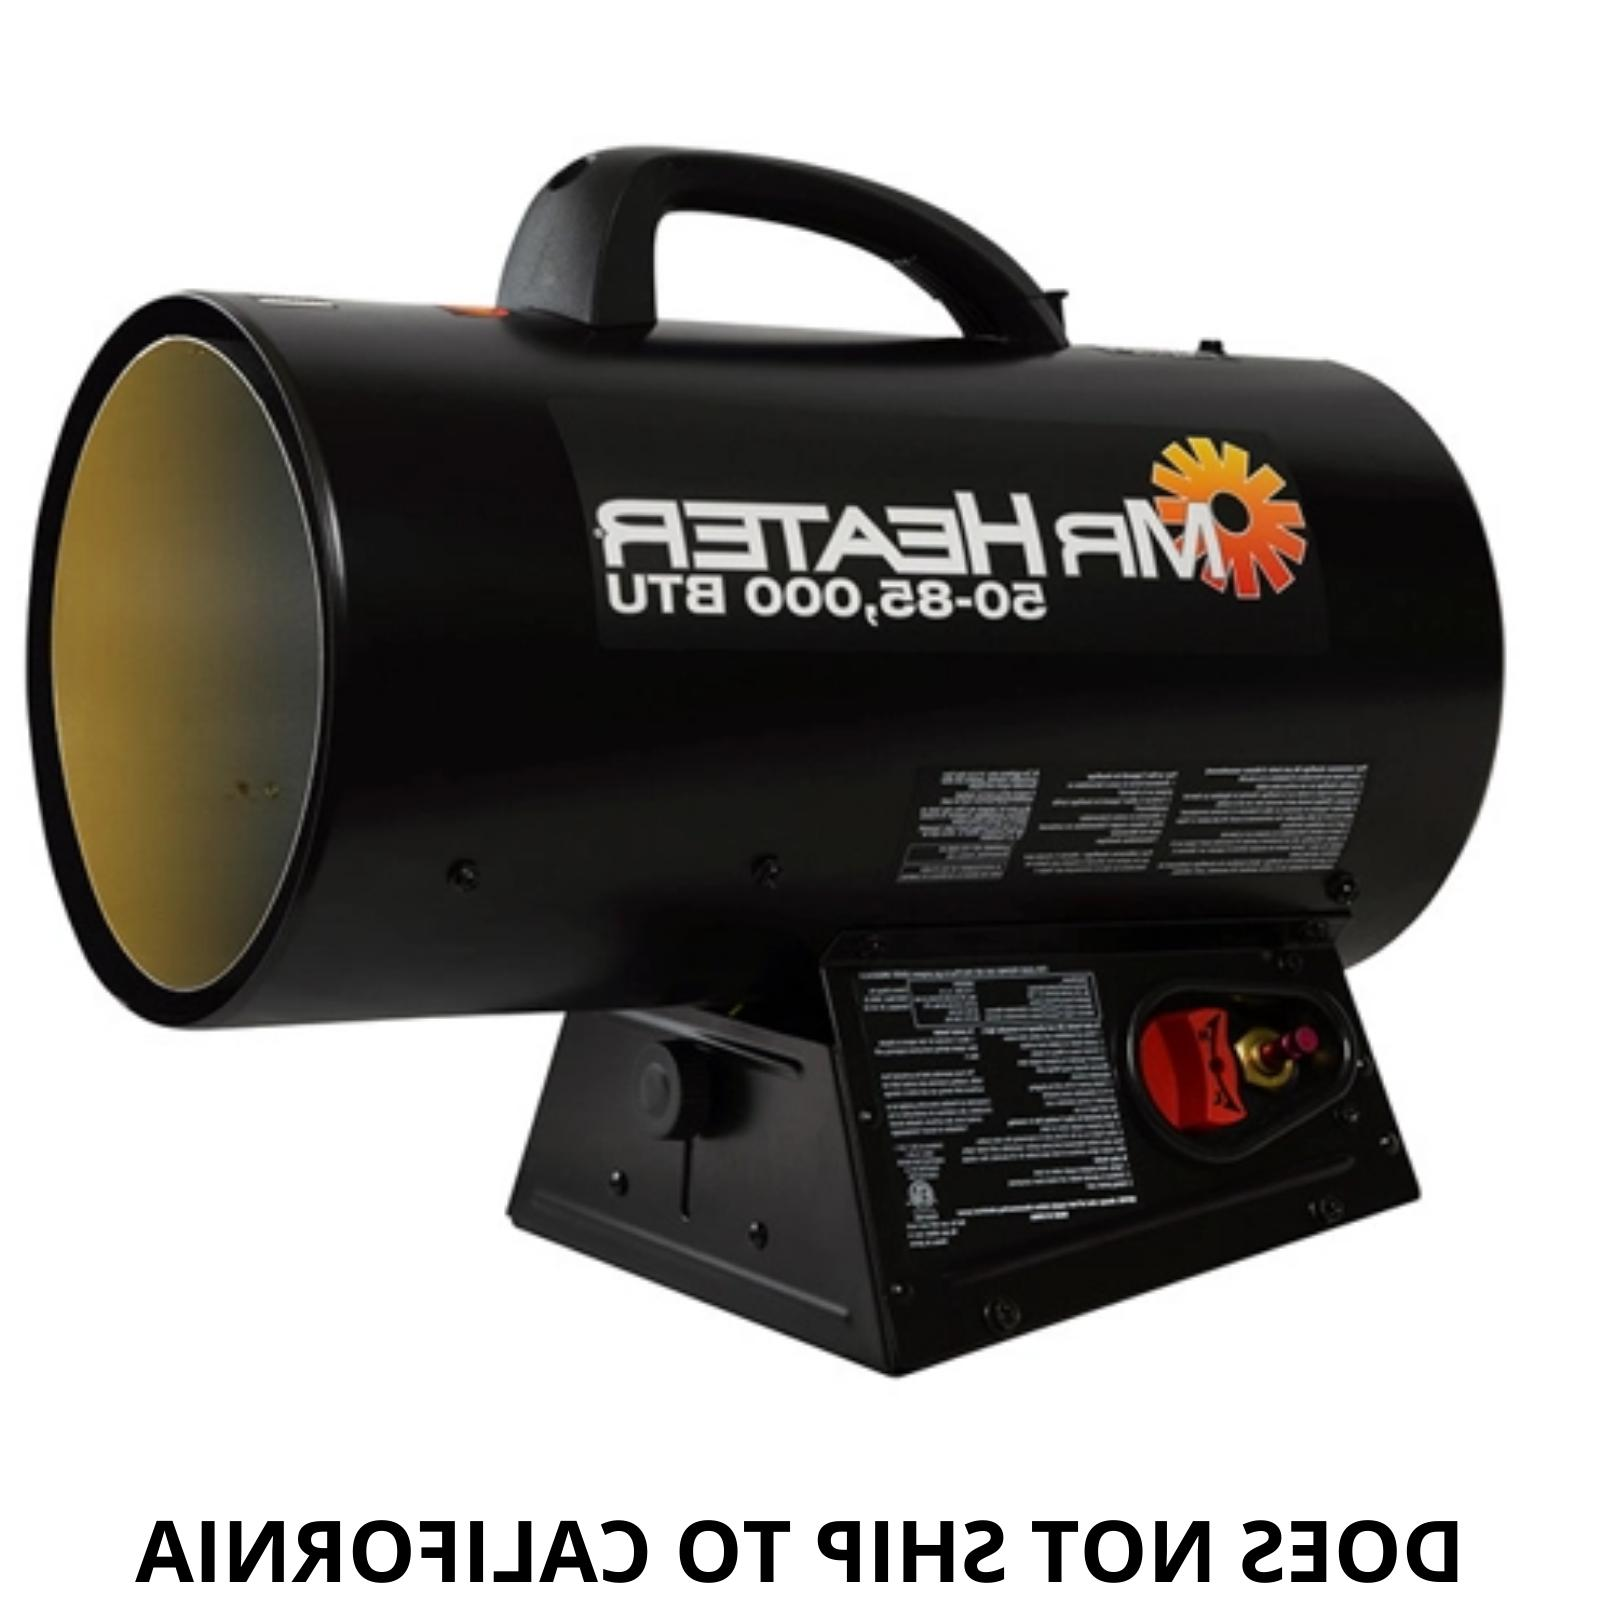 Mr. Heater 50,000-85,000 BTU Forced Heater Indoor Outdoor 110 V New